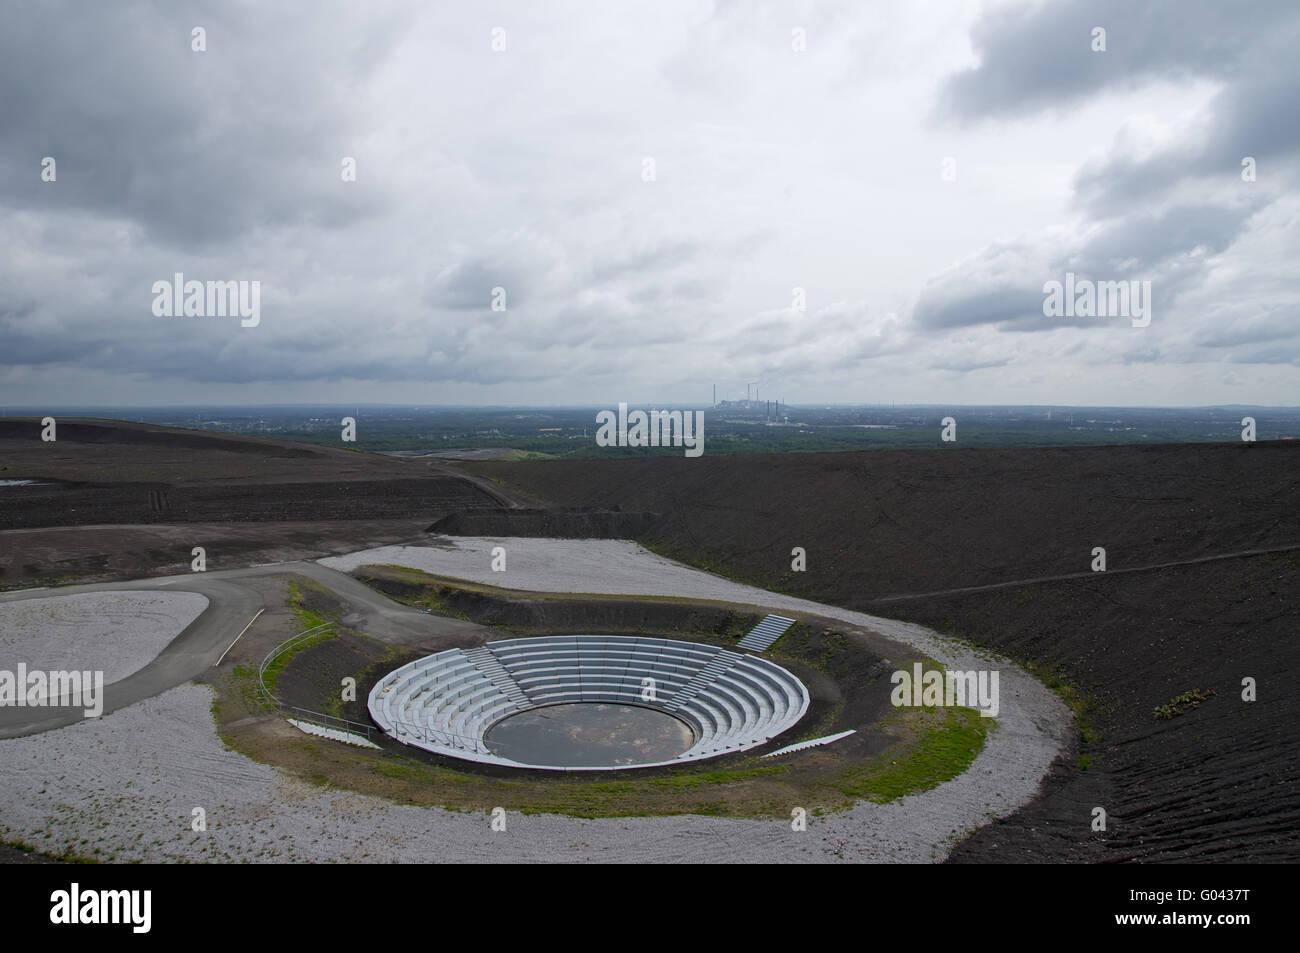 Amphitheater at the mining dump Haniel, Bottrop, G - Stock Image